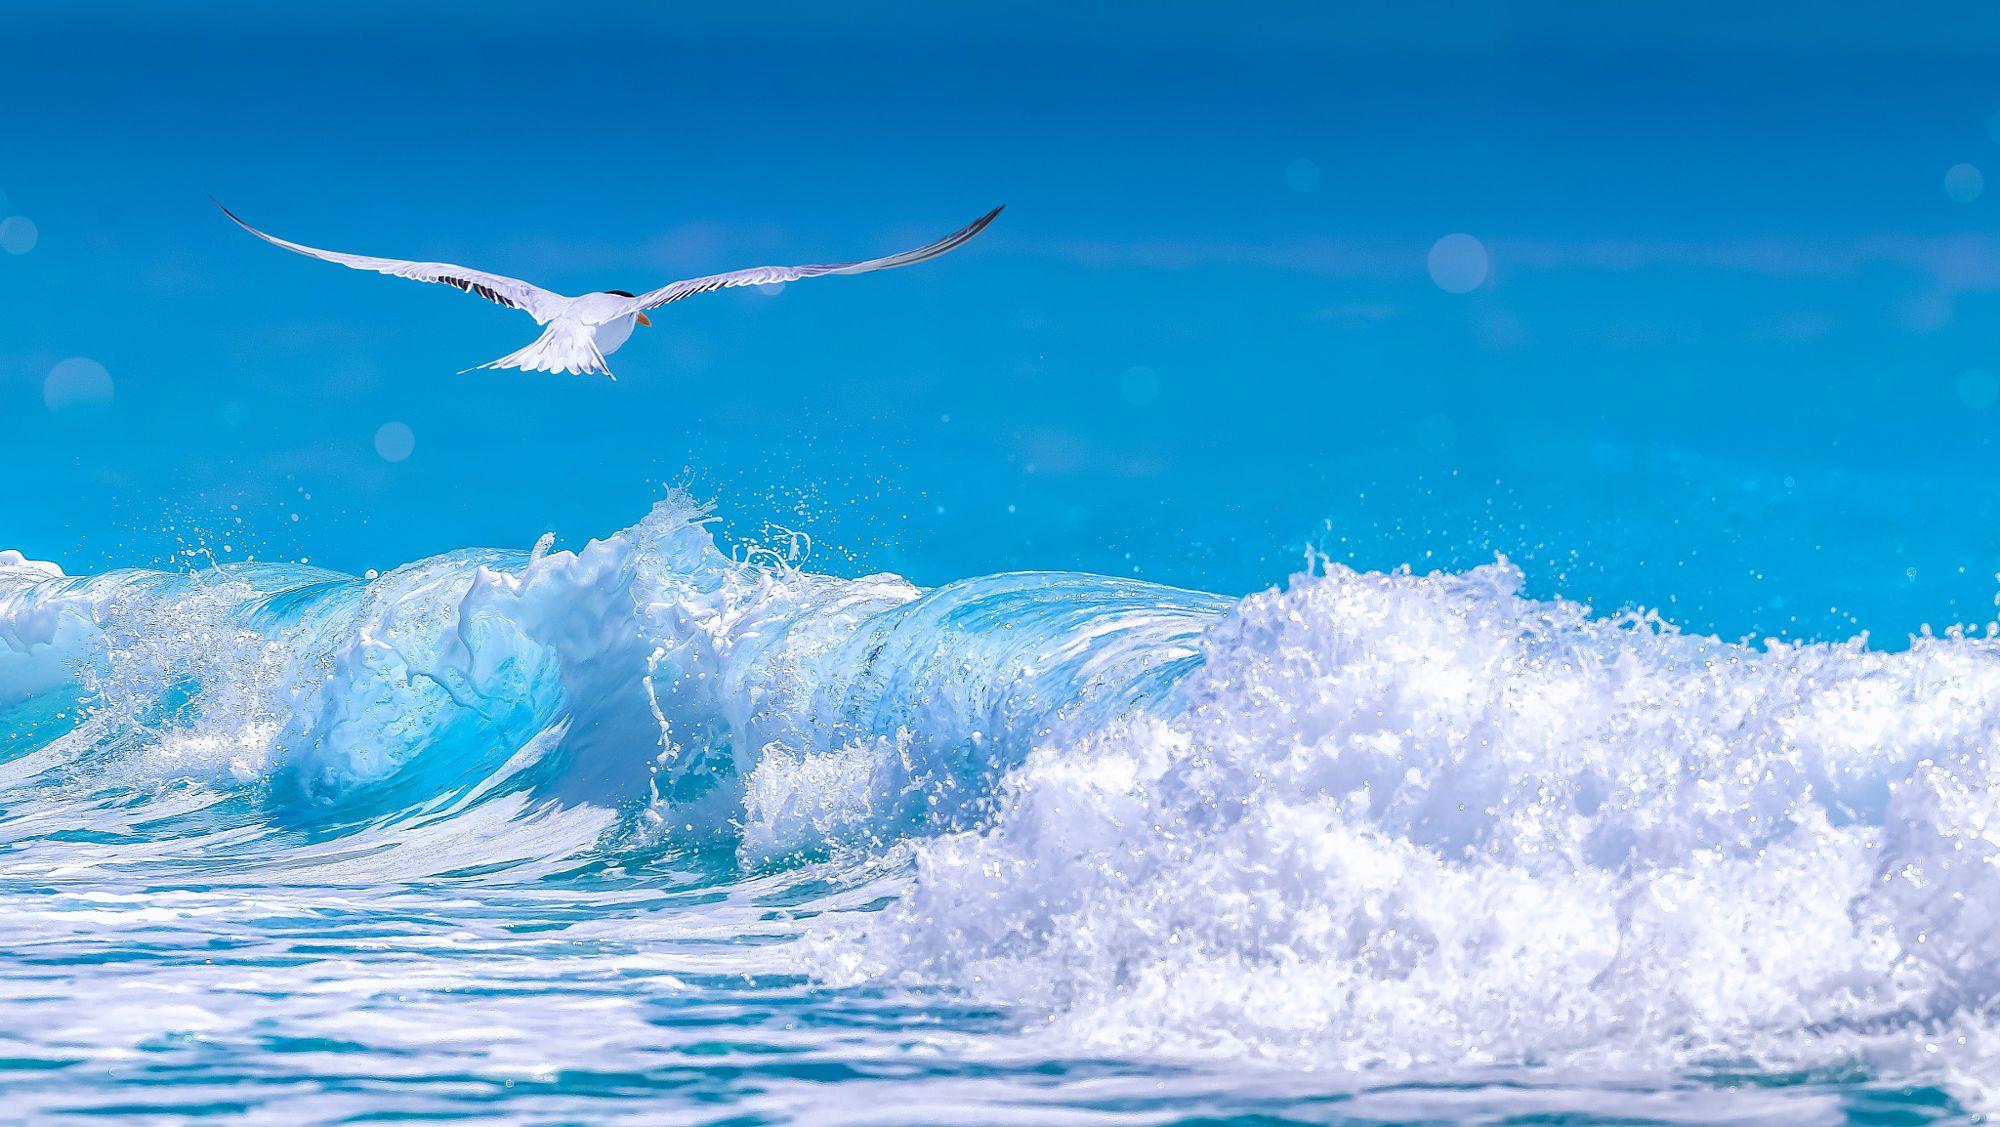 Blue Waves Waves Blue Waves Arctic Tern